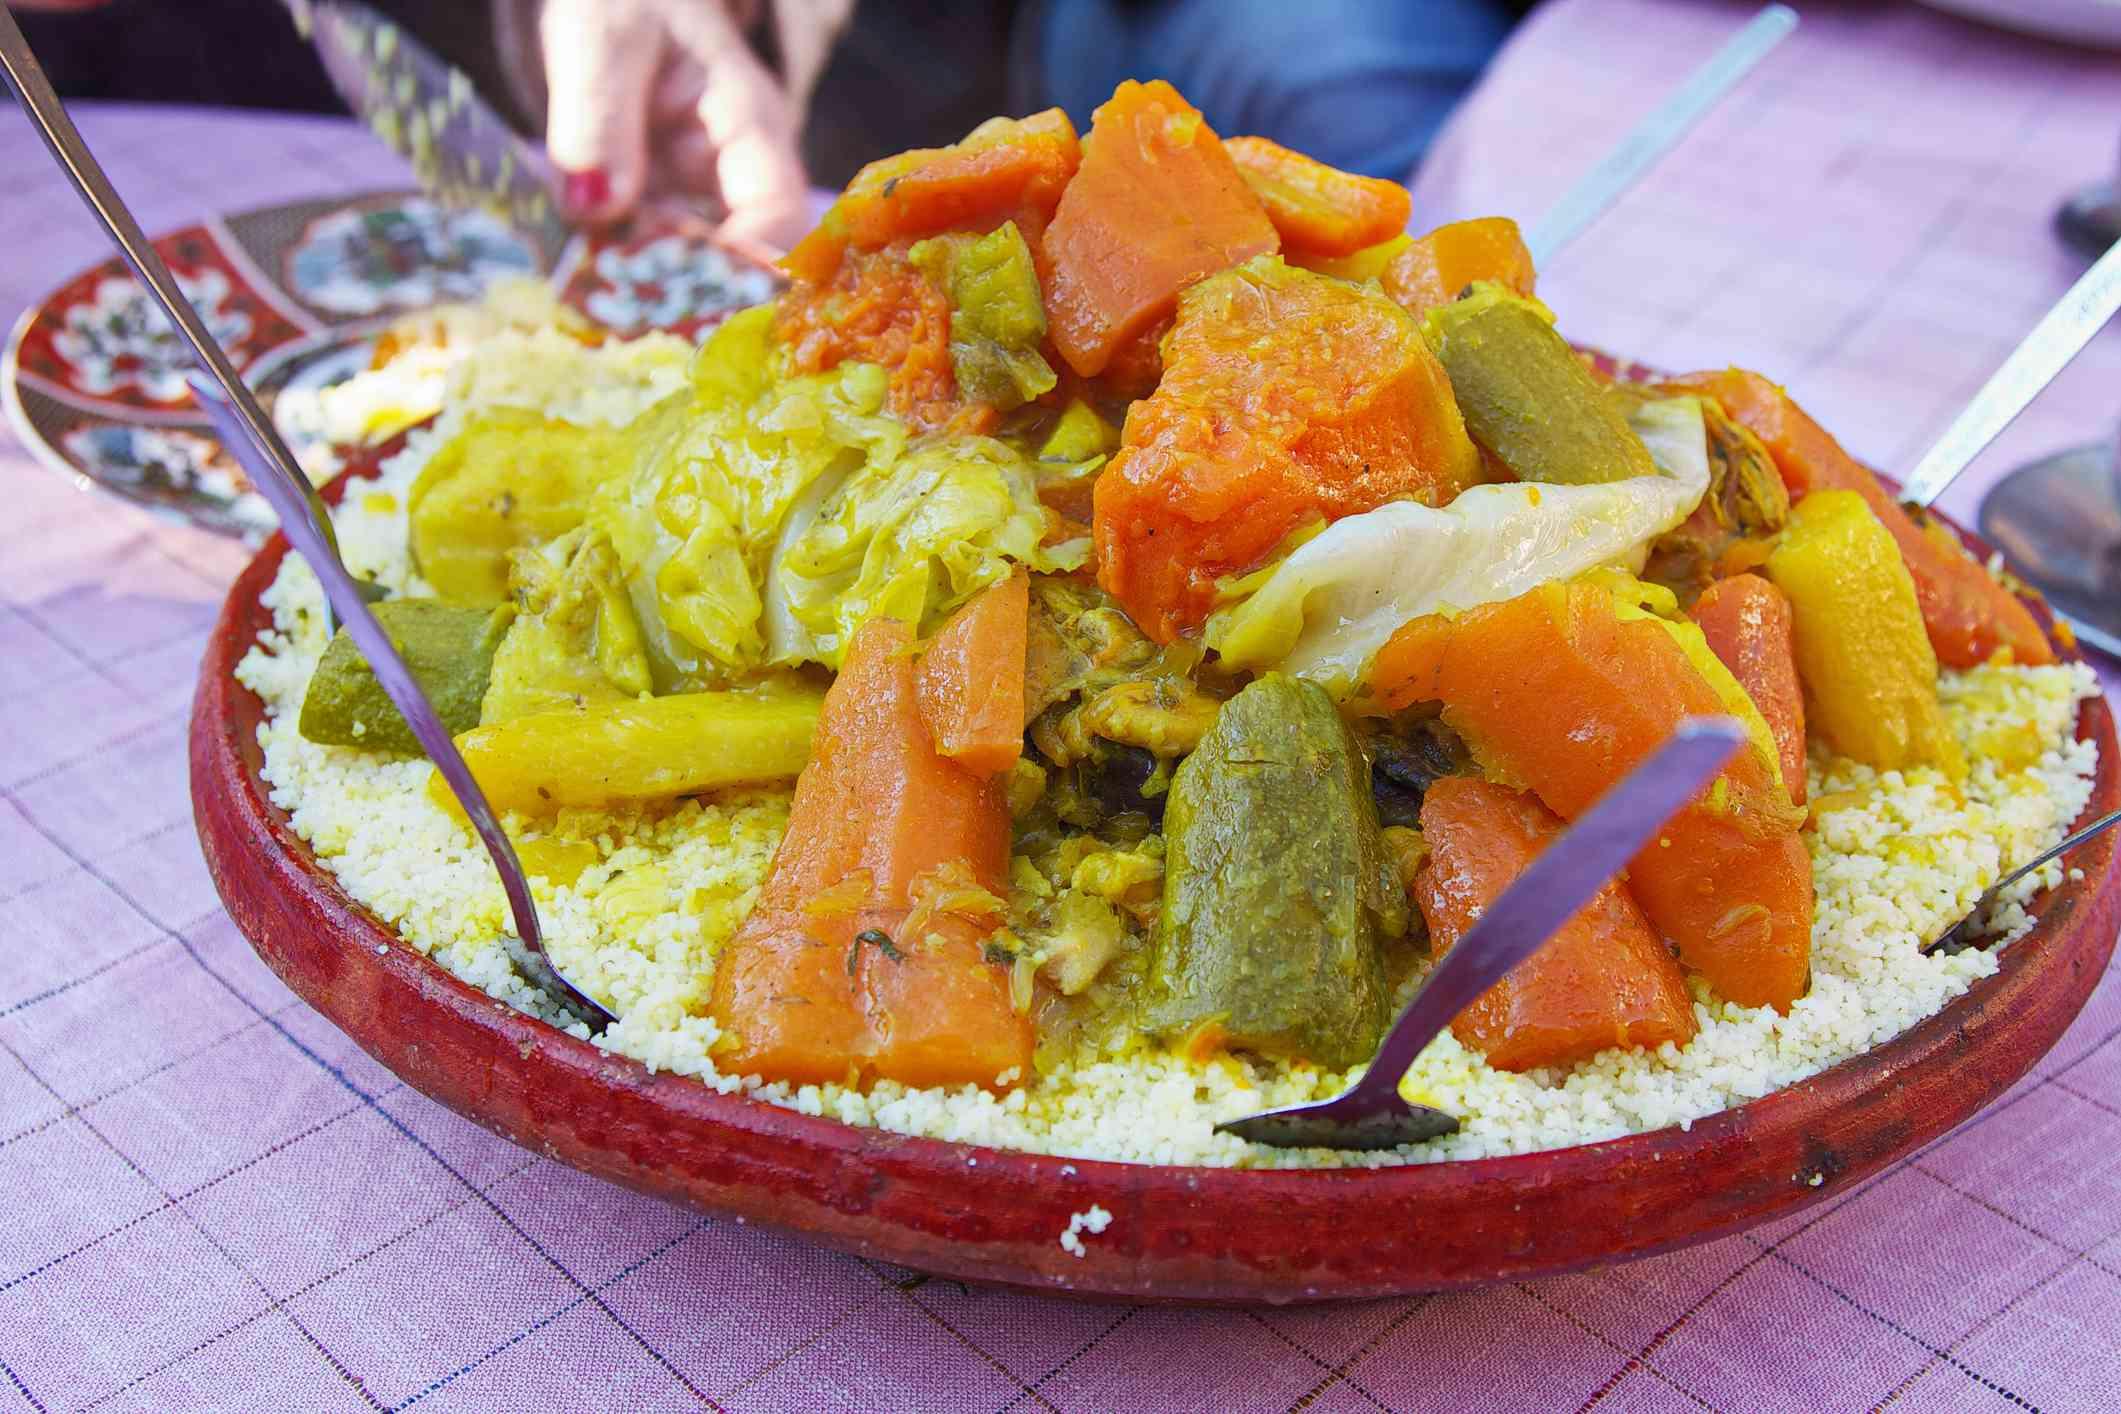 Traditional Moroccan tagine